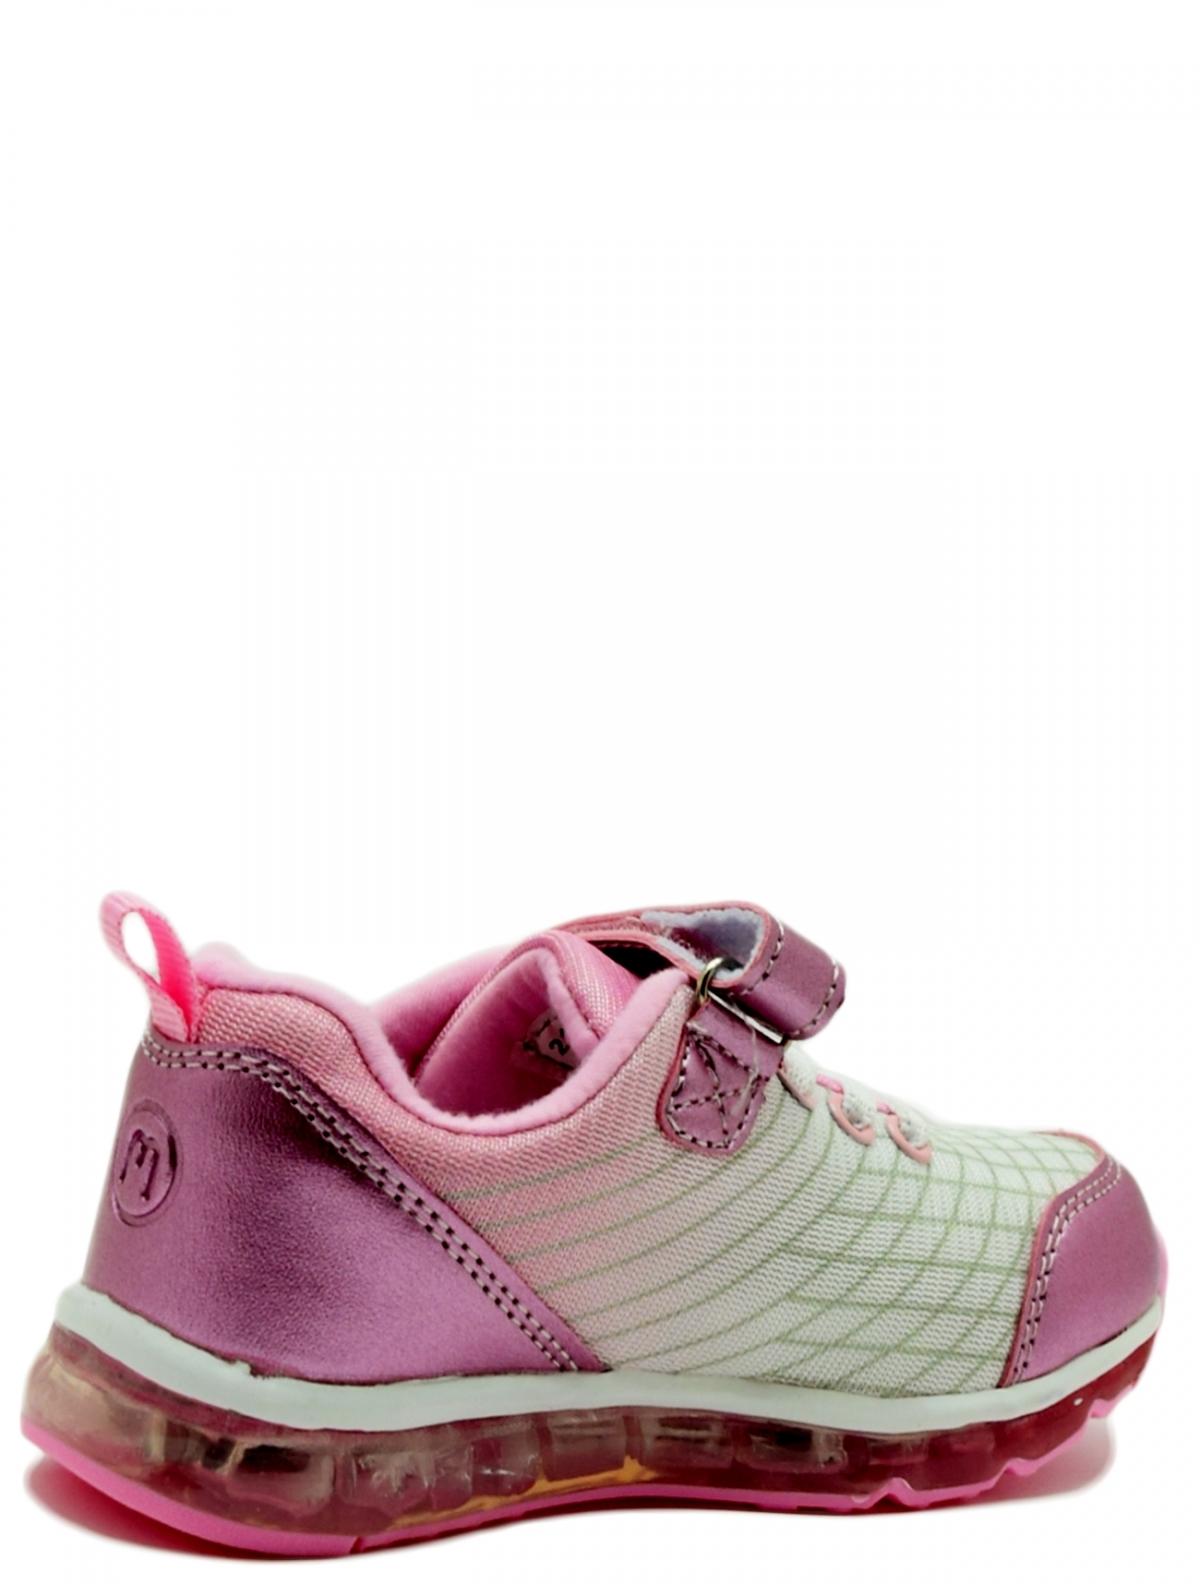 Mursu 211113 кроссовки для девочки